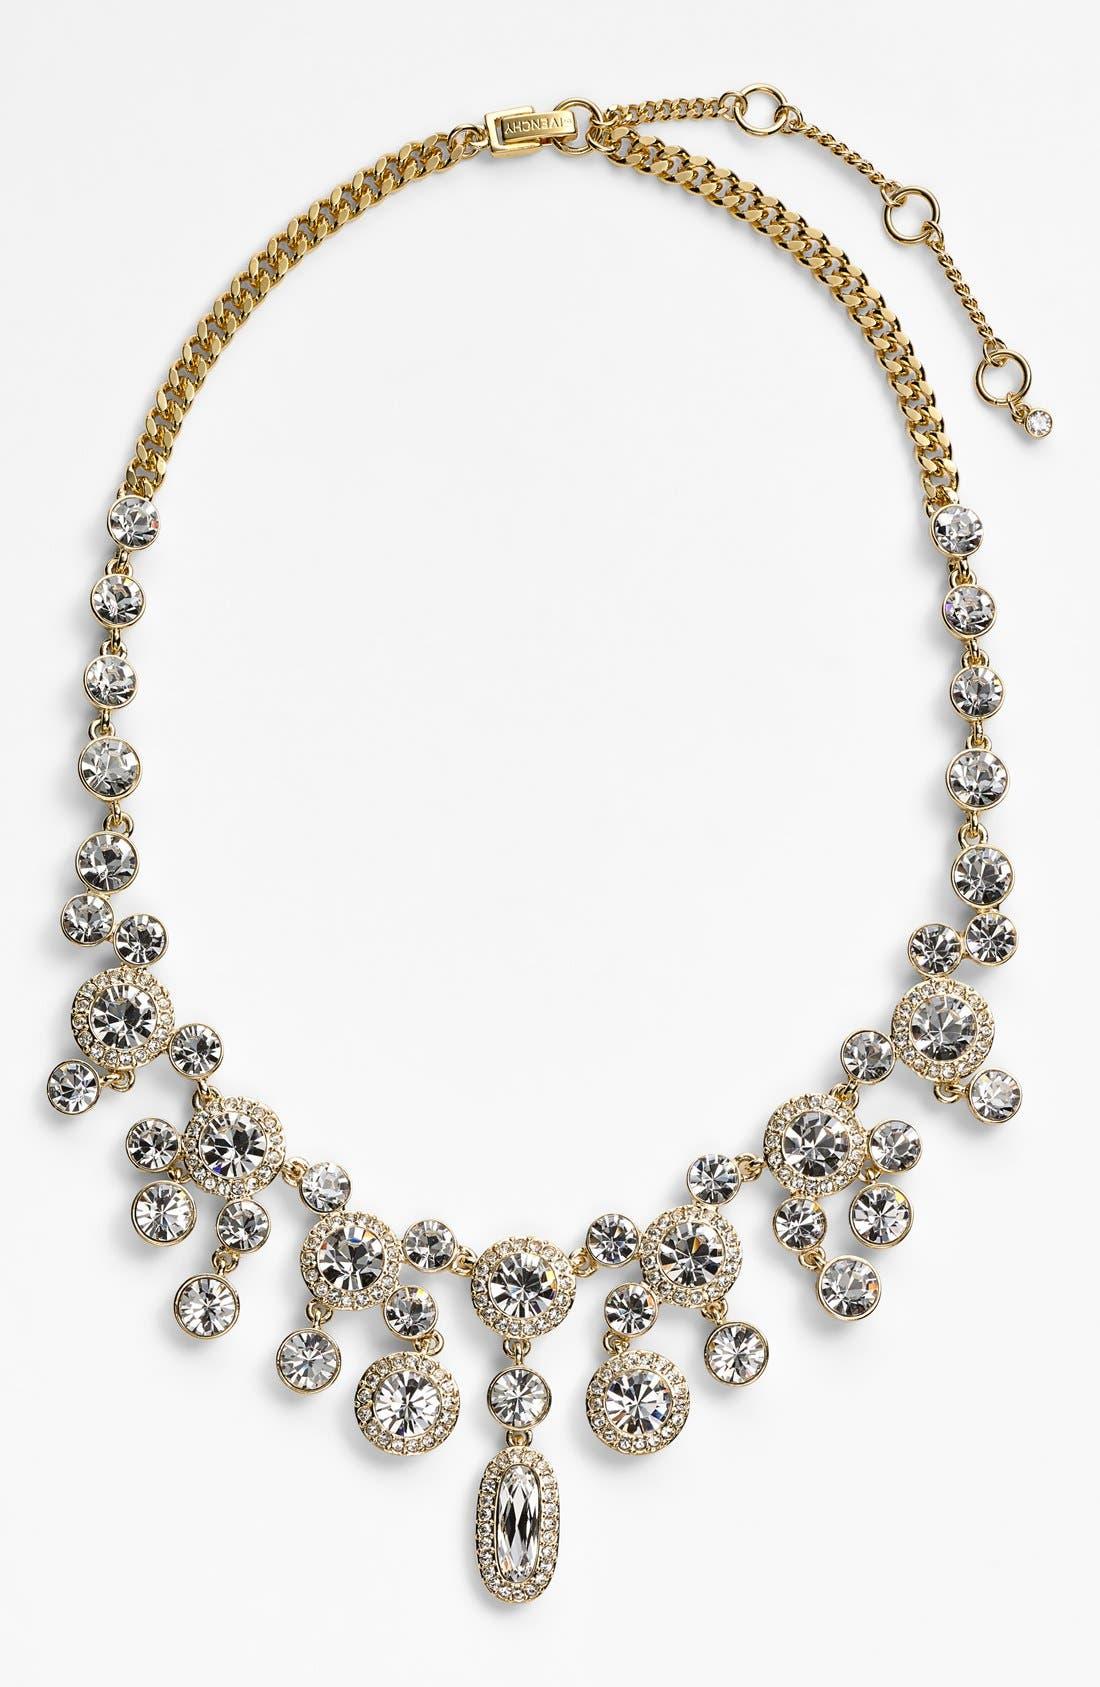 Main Image - Givenchy Crystal Bib Necklace